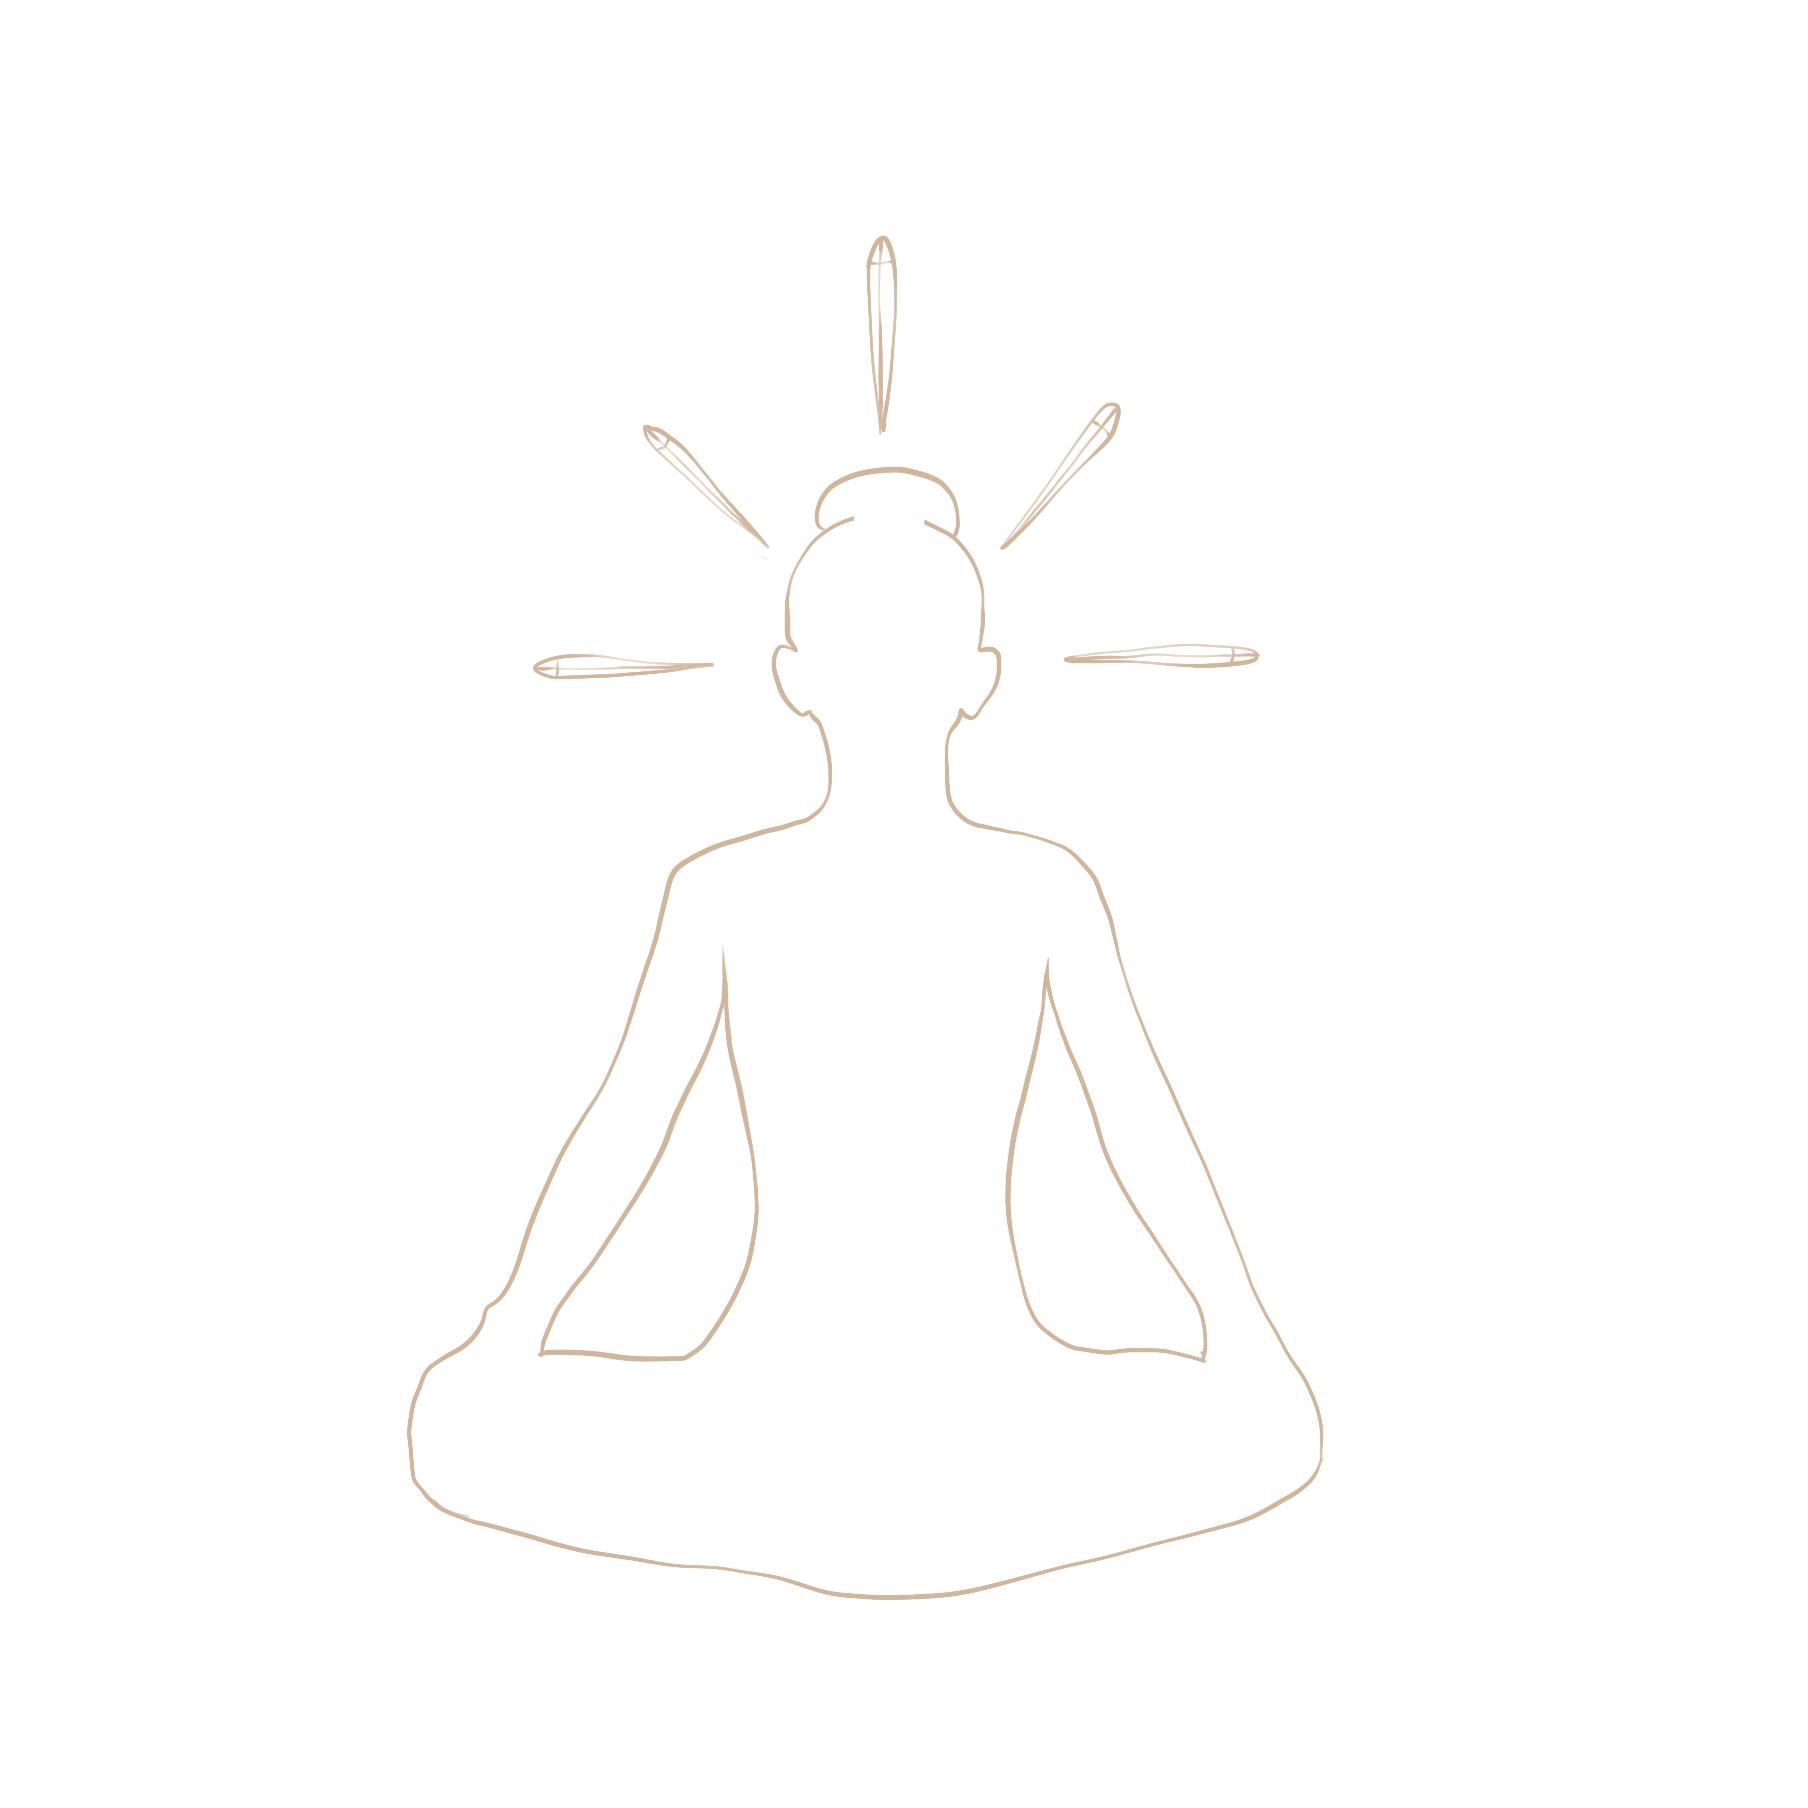 meditation-mindfulness-bali